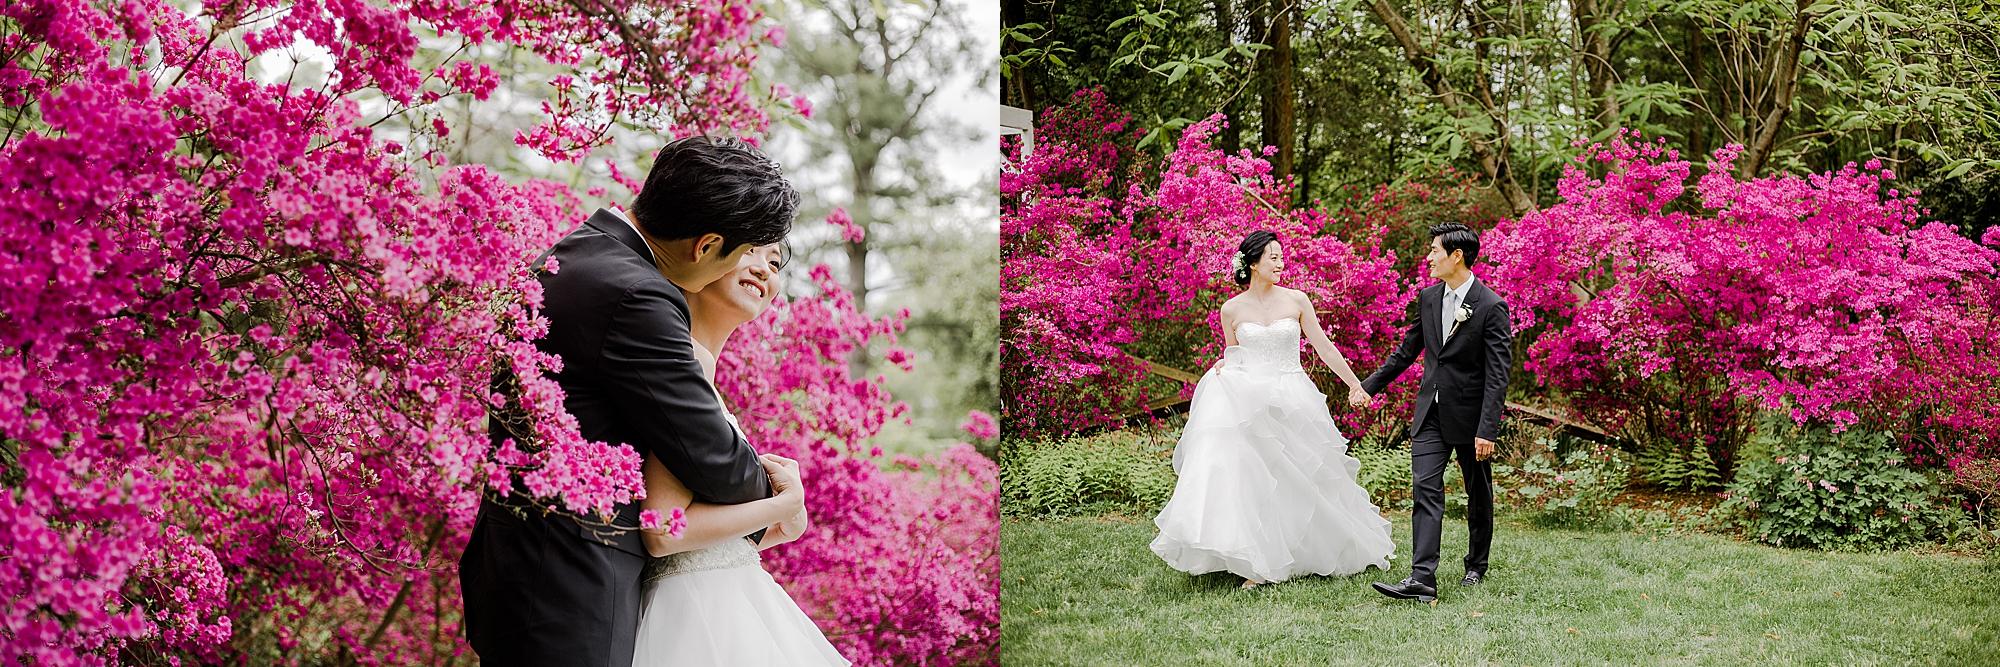 NYC wedding photography couples' choice awards